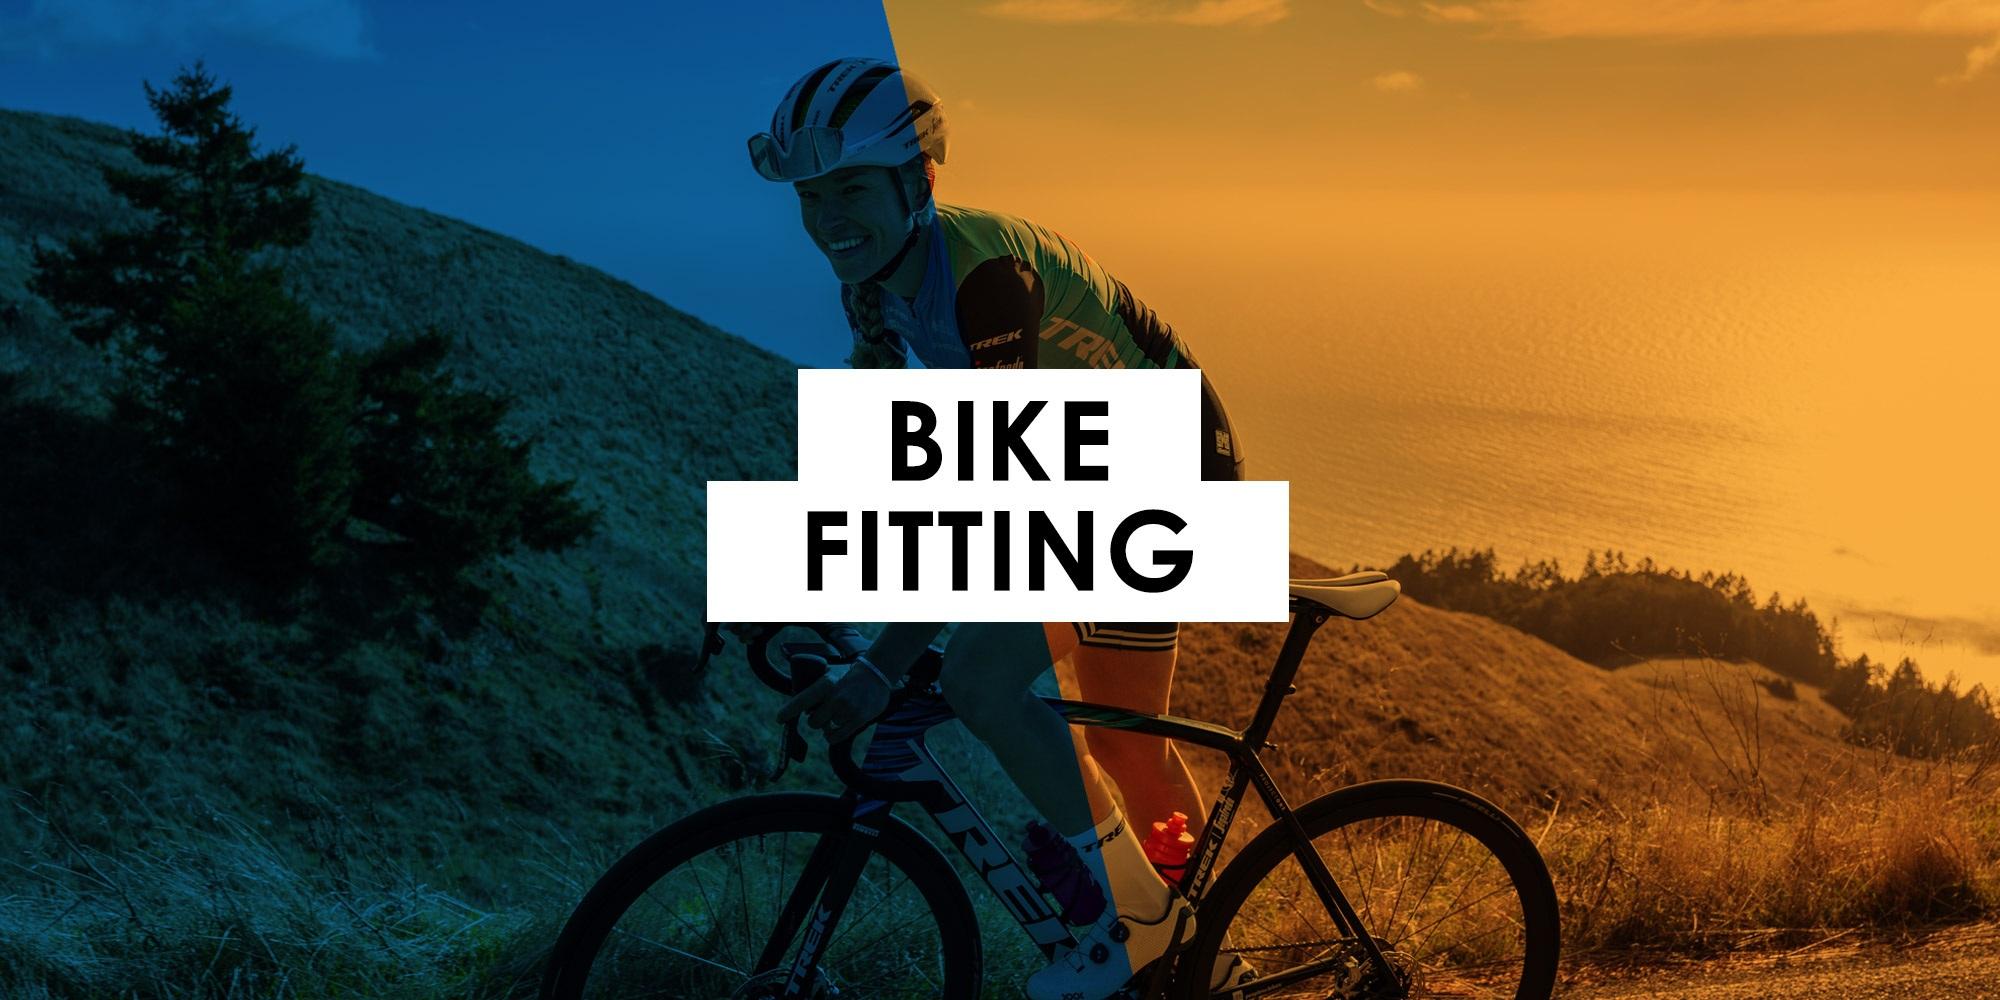 Bike Fitting Services at Bikes Palm Beach